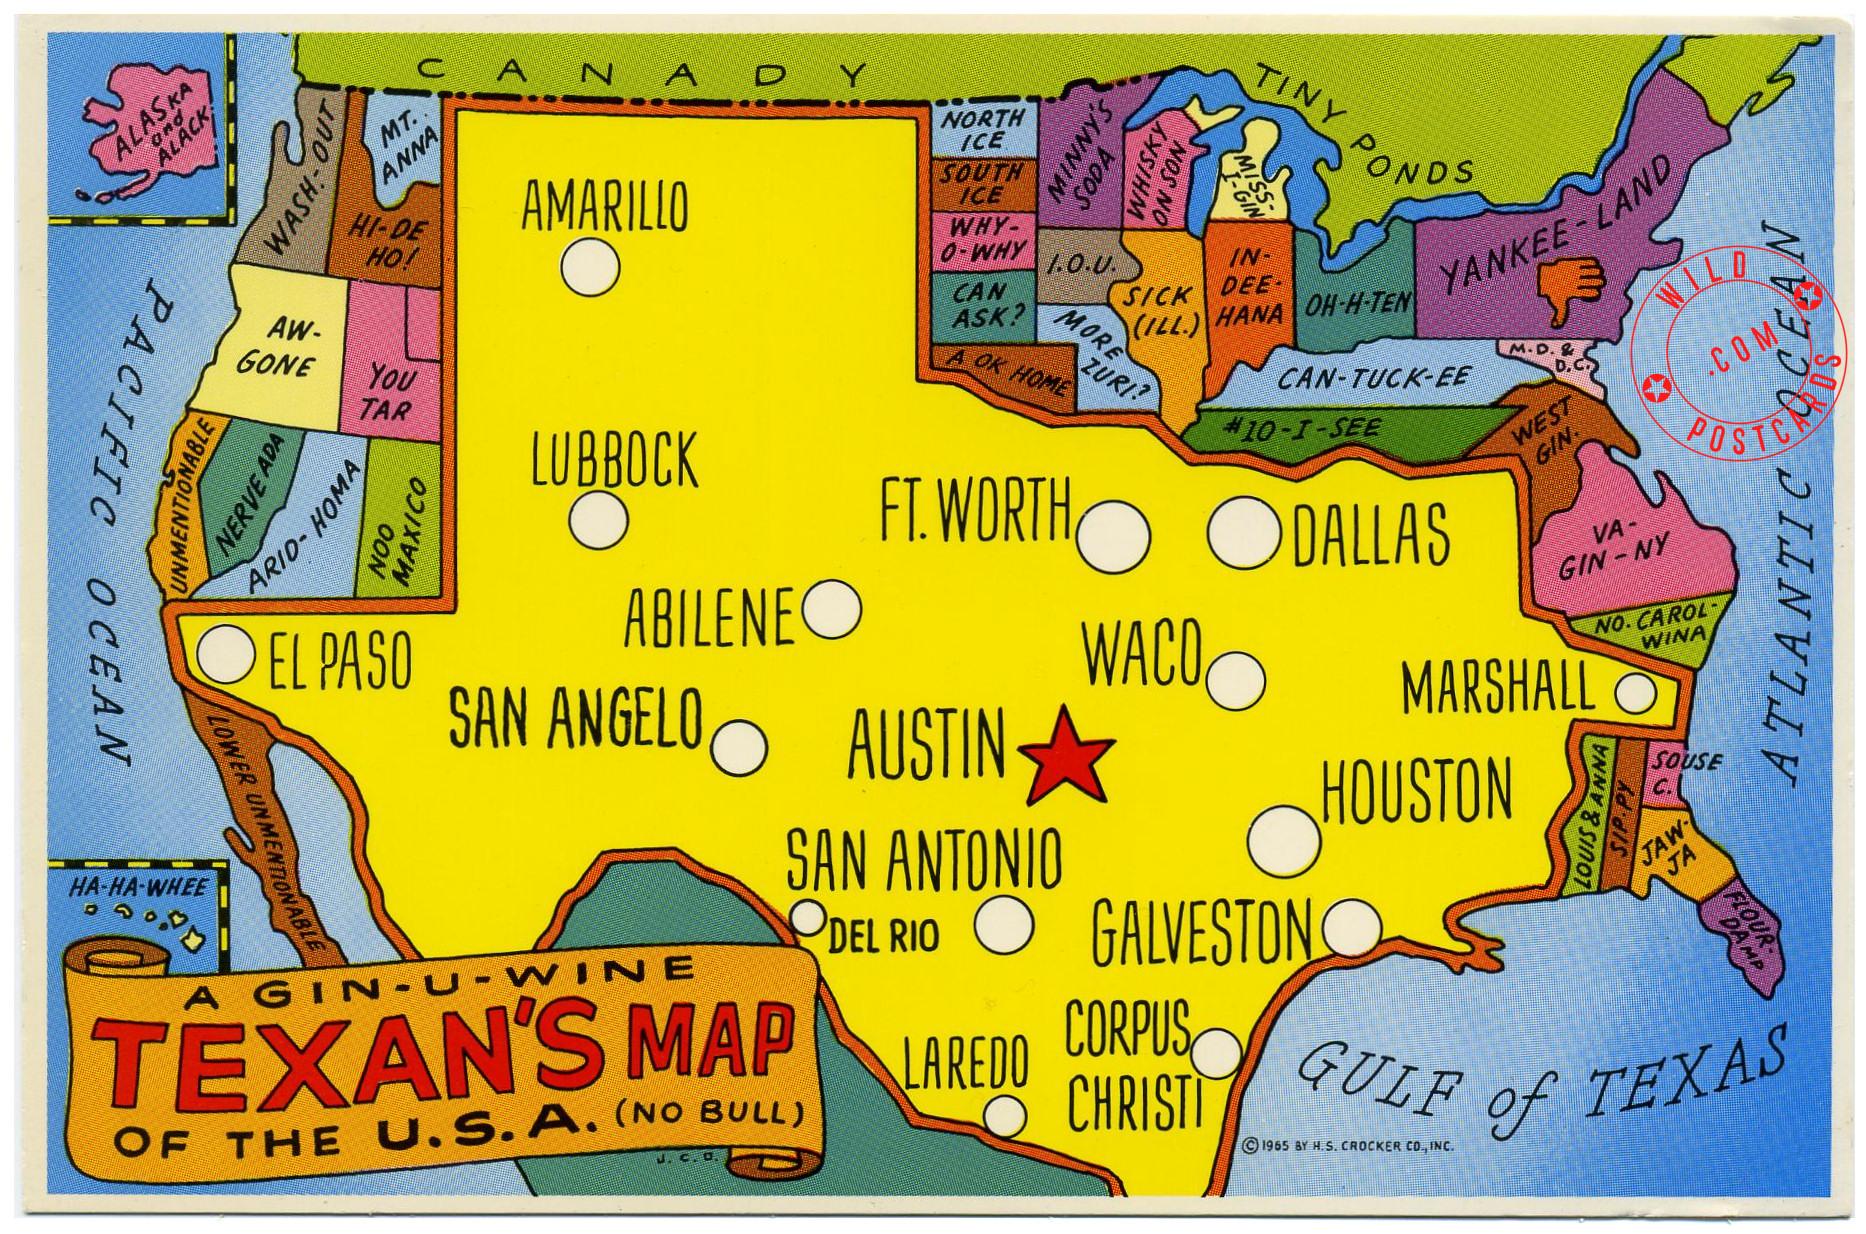 https://vccconcierge.files.wordpress.com/2012/04/a-texans-map.jpg